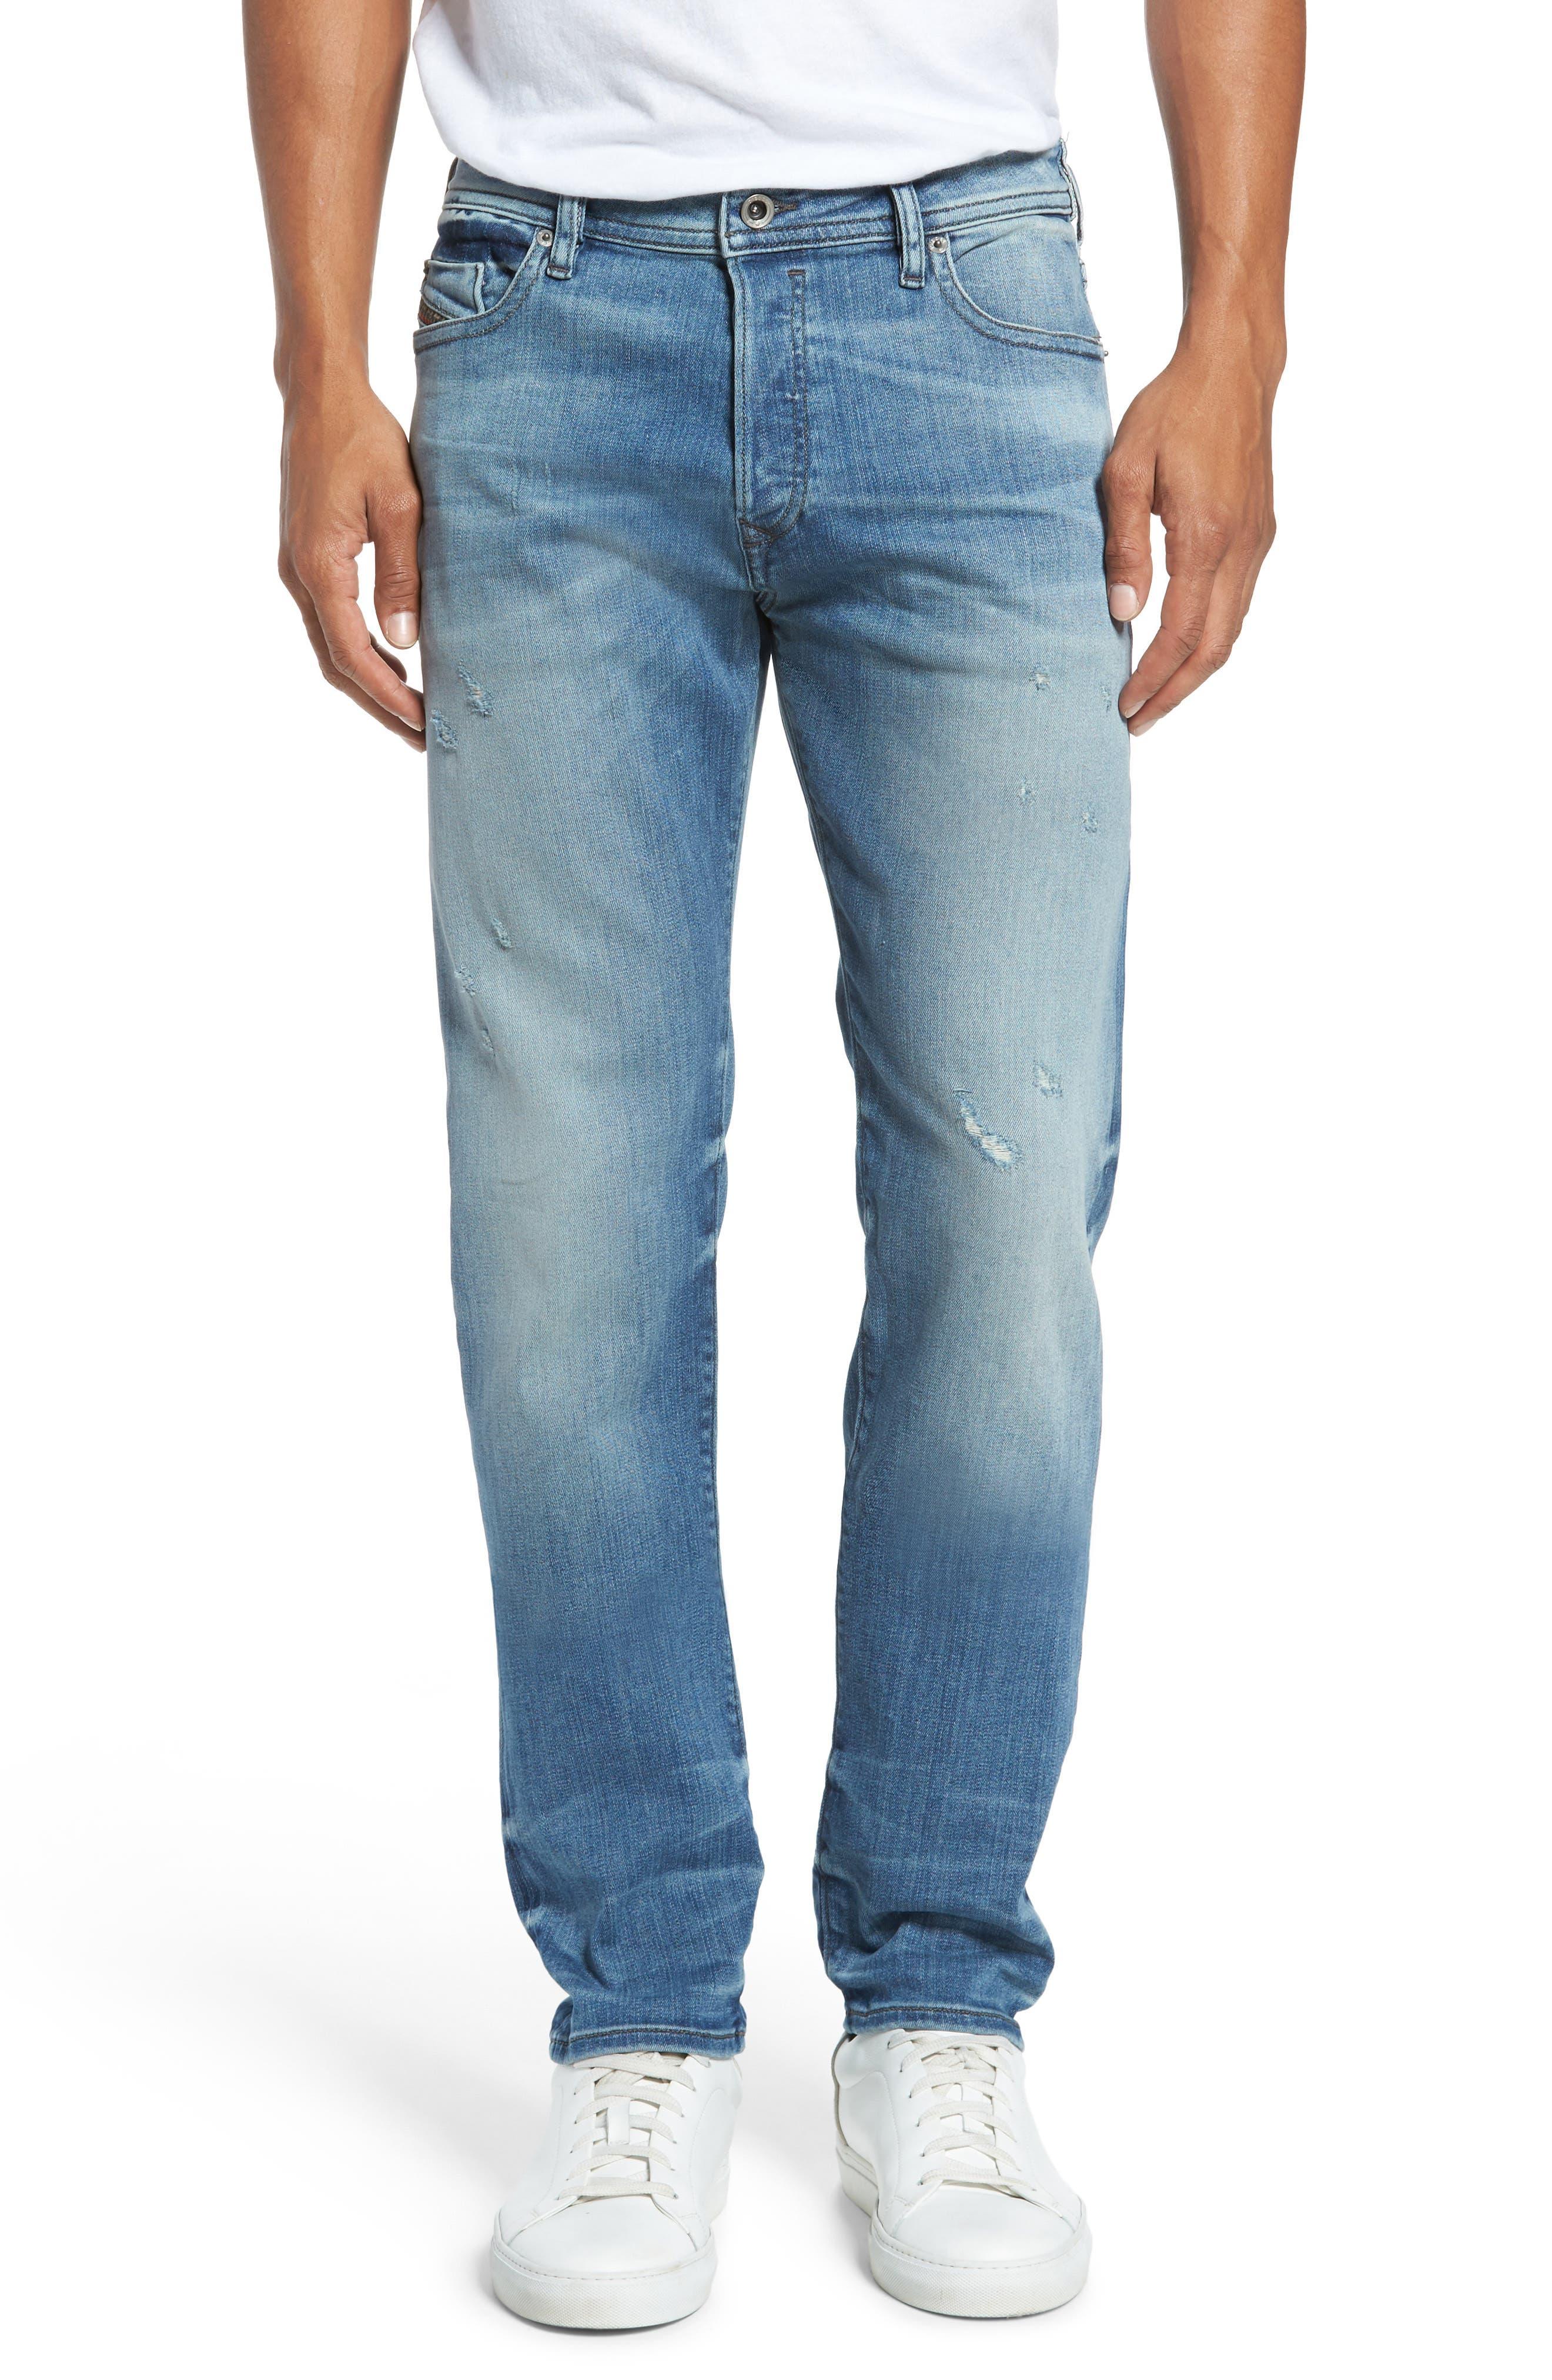 'Buster' Slim Straight Fit Jeans,                         Main,                         color, Denim